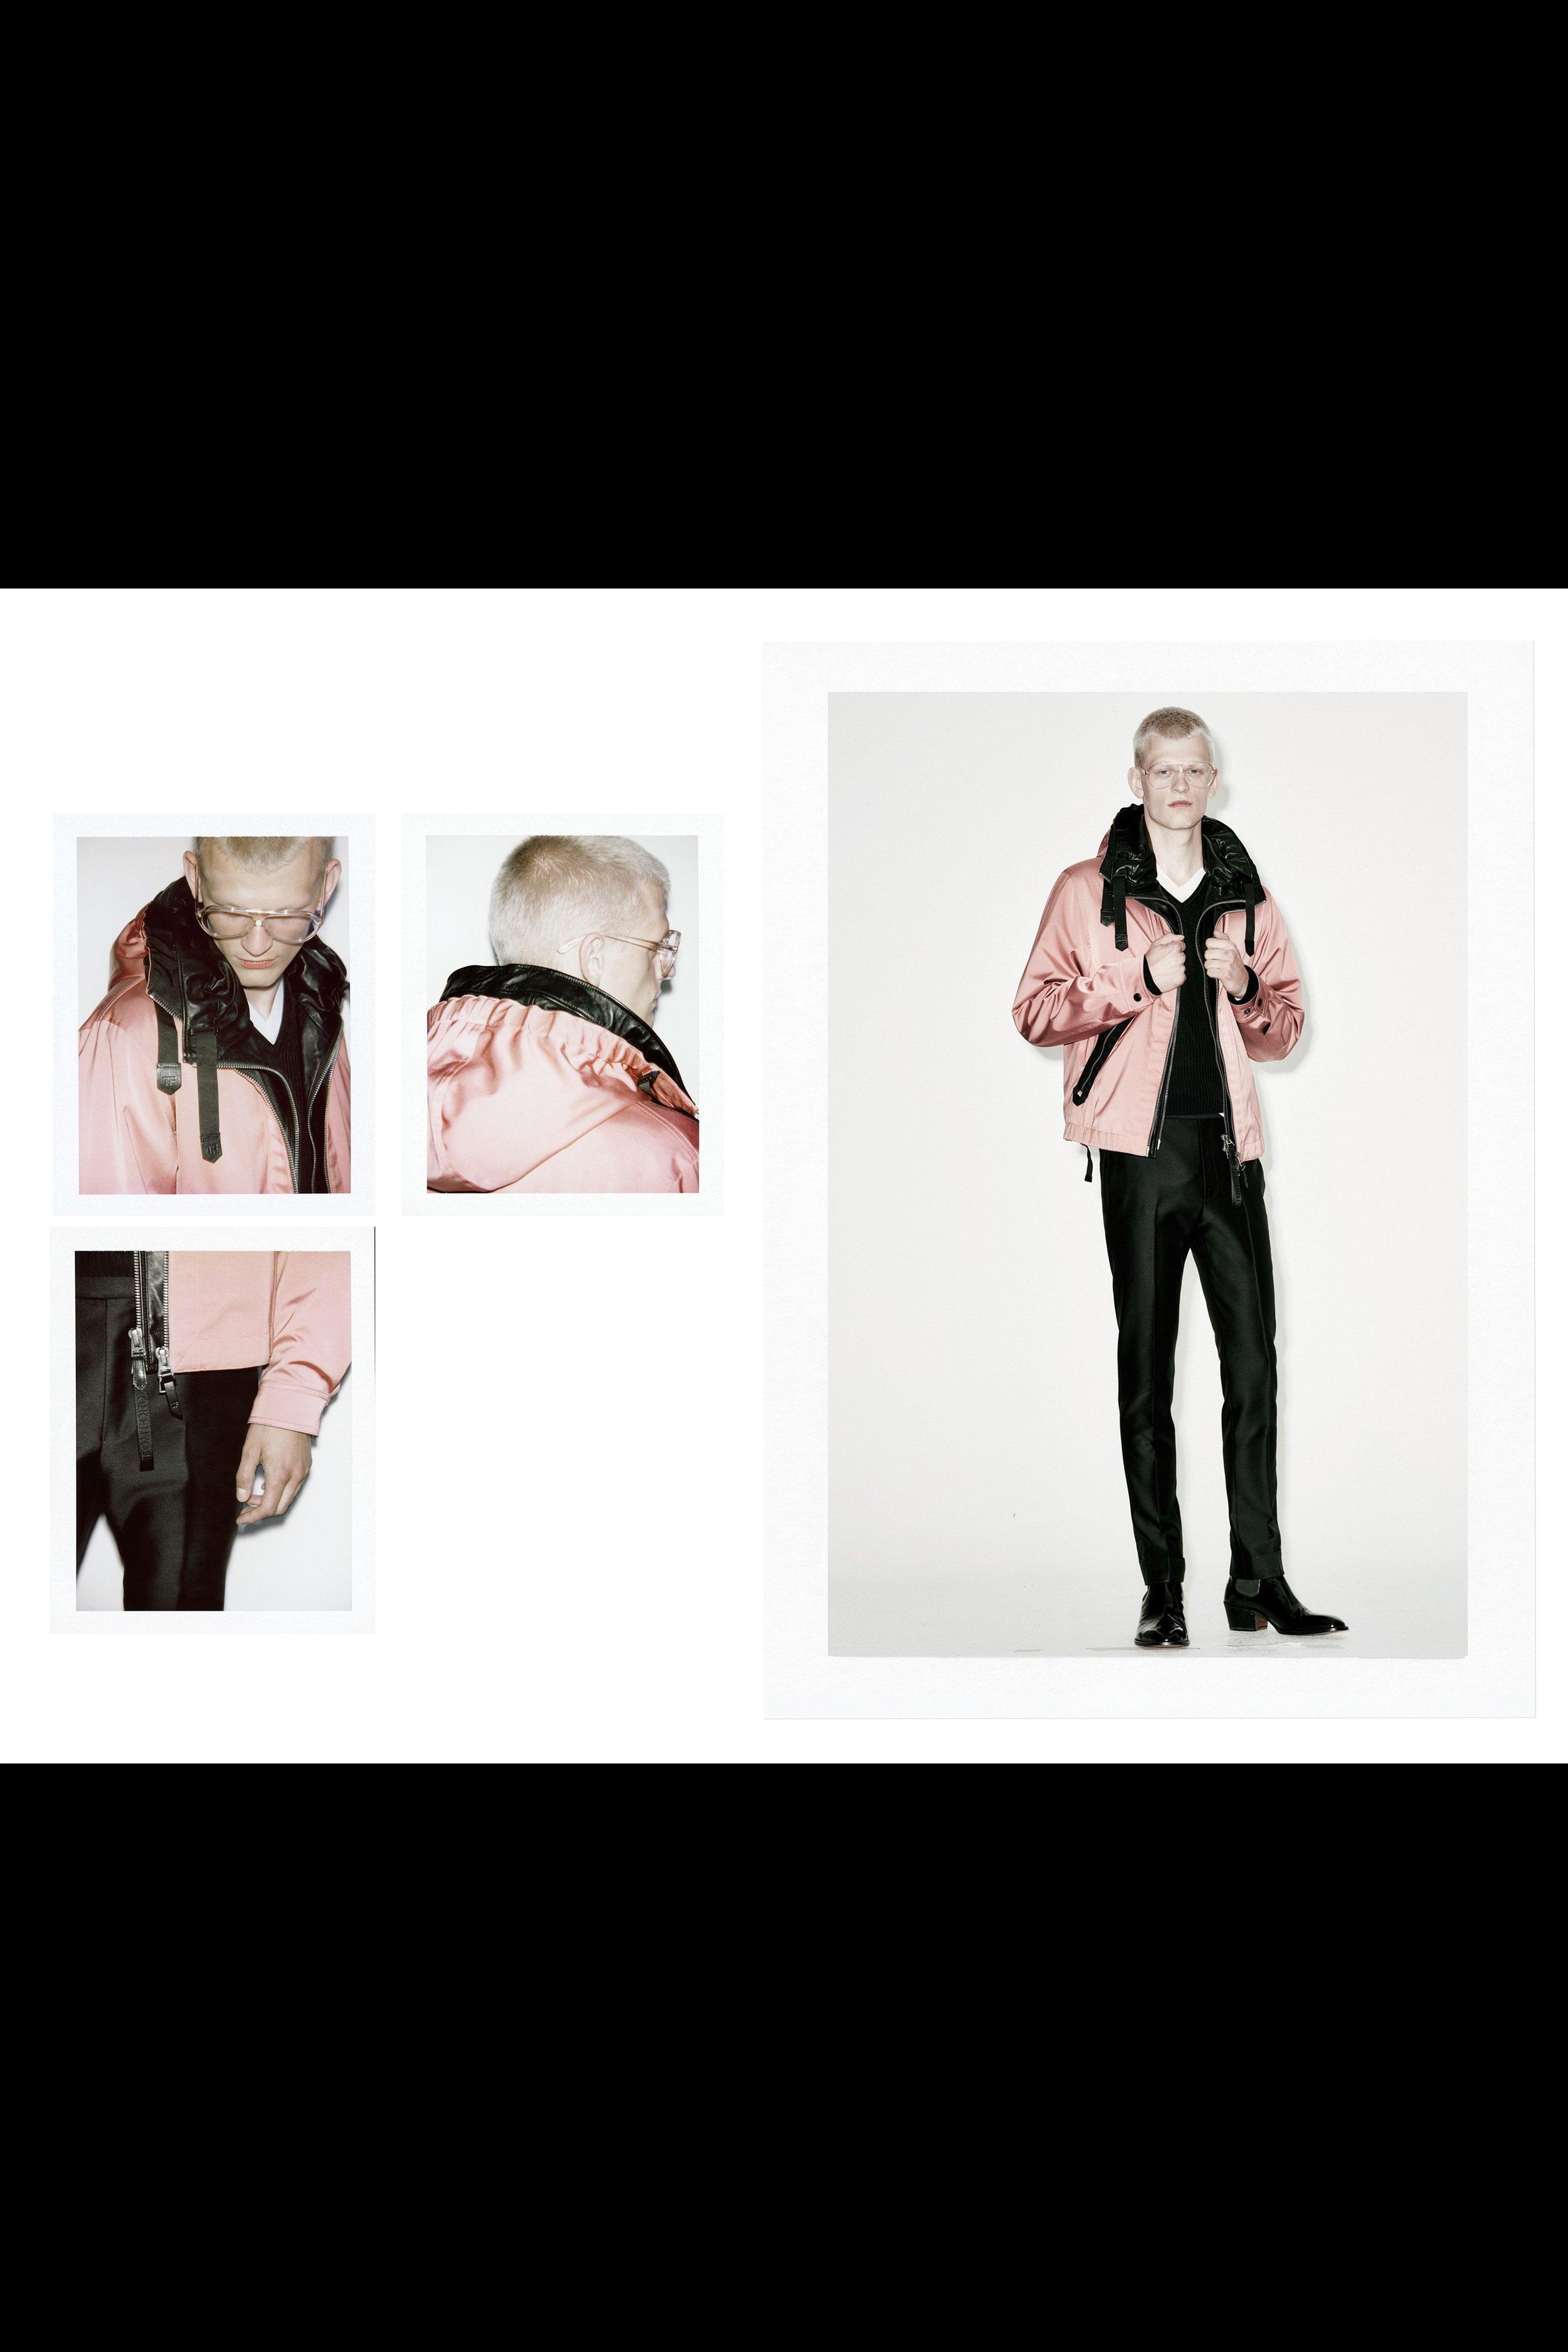 00009-Tom-Ford-vogue-menswear-spring-2019-pr.jpg